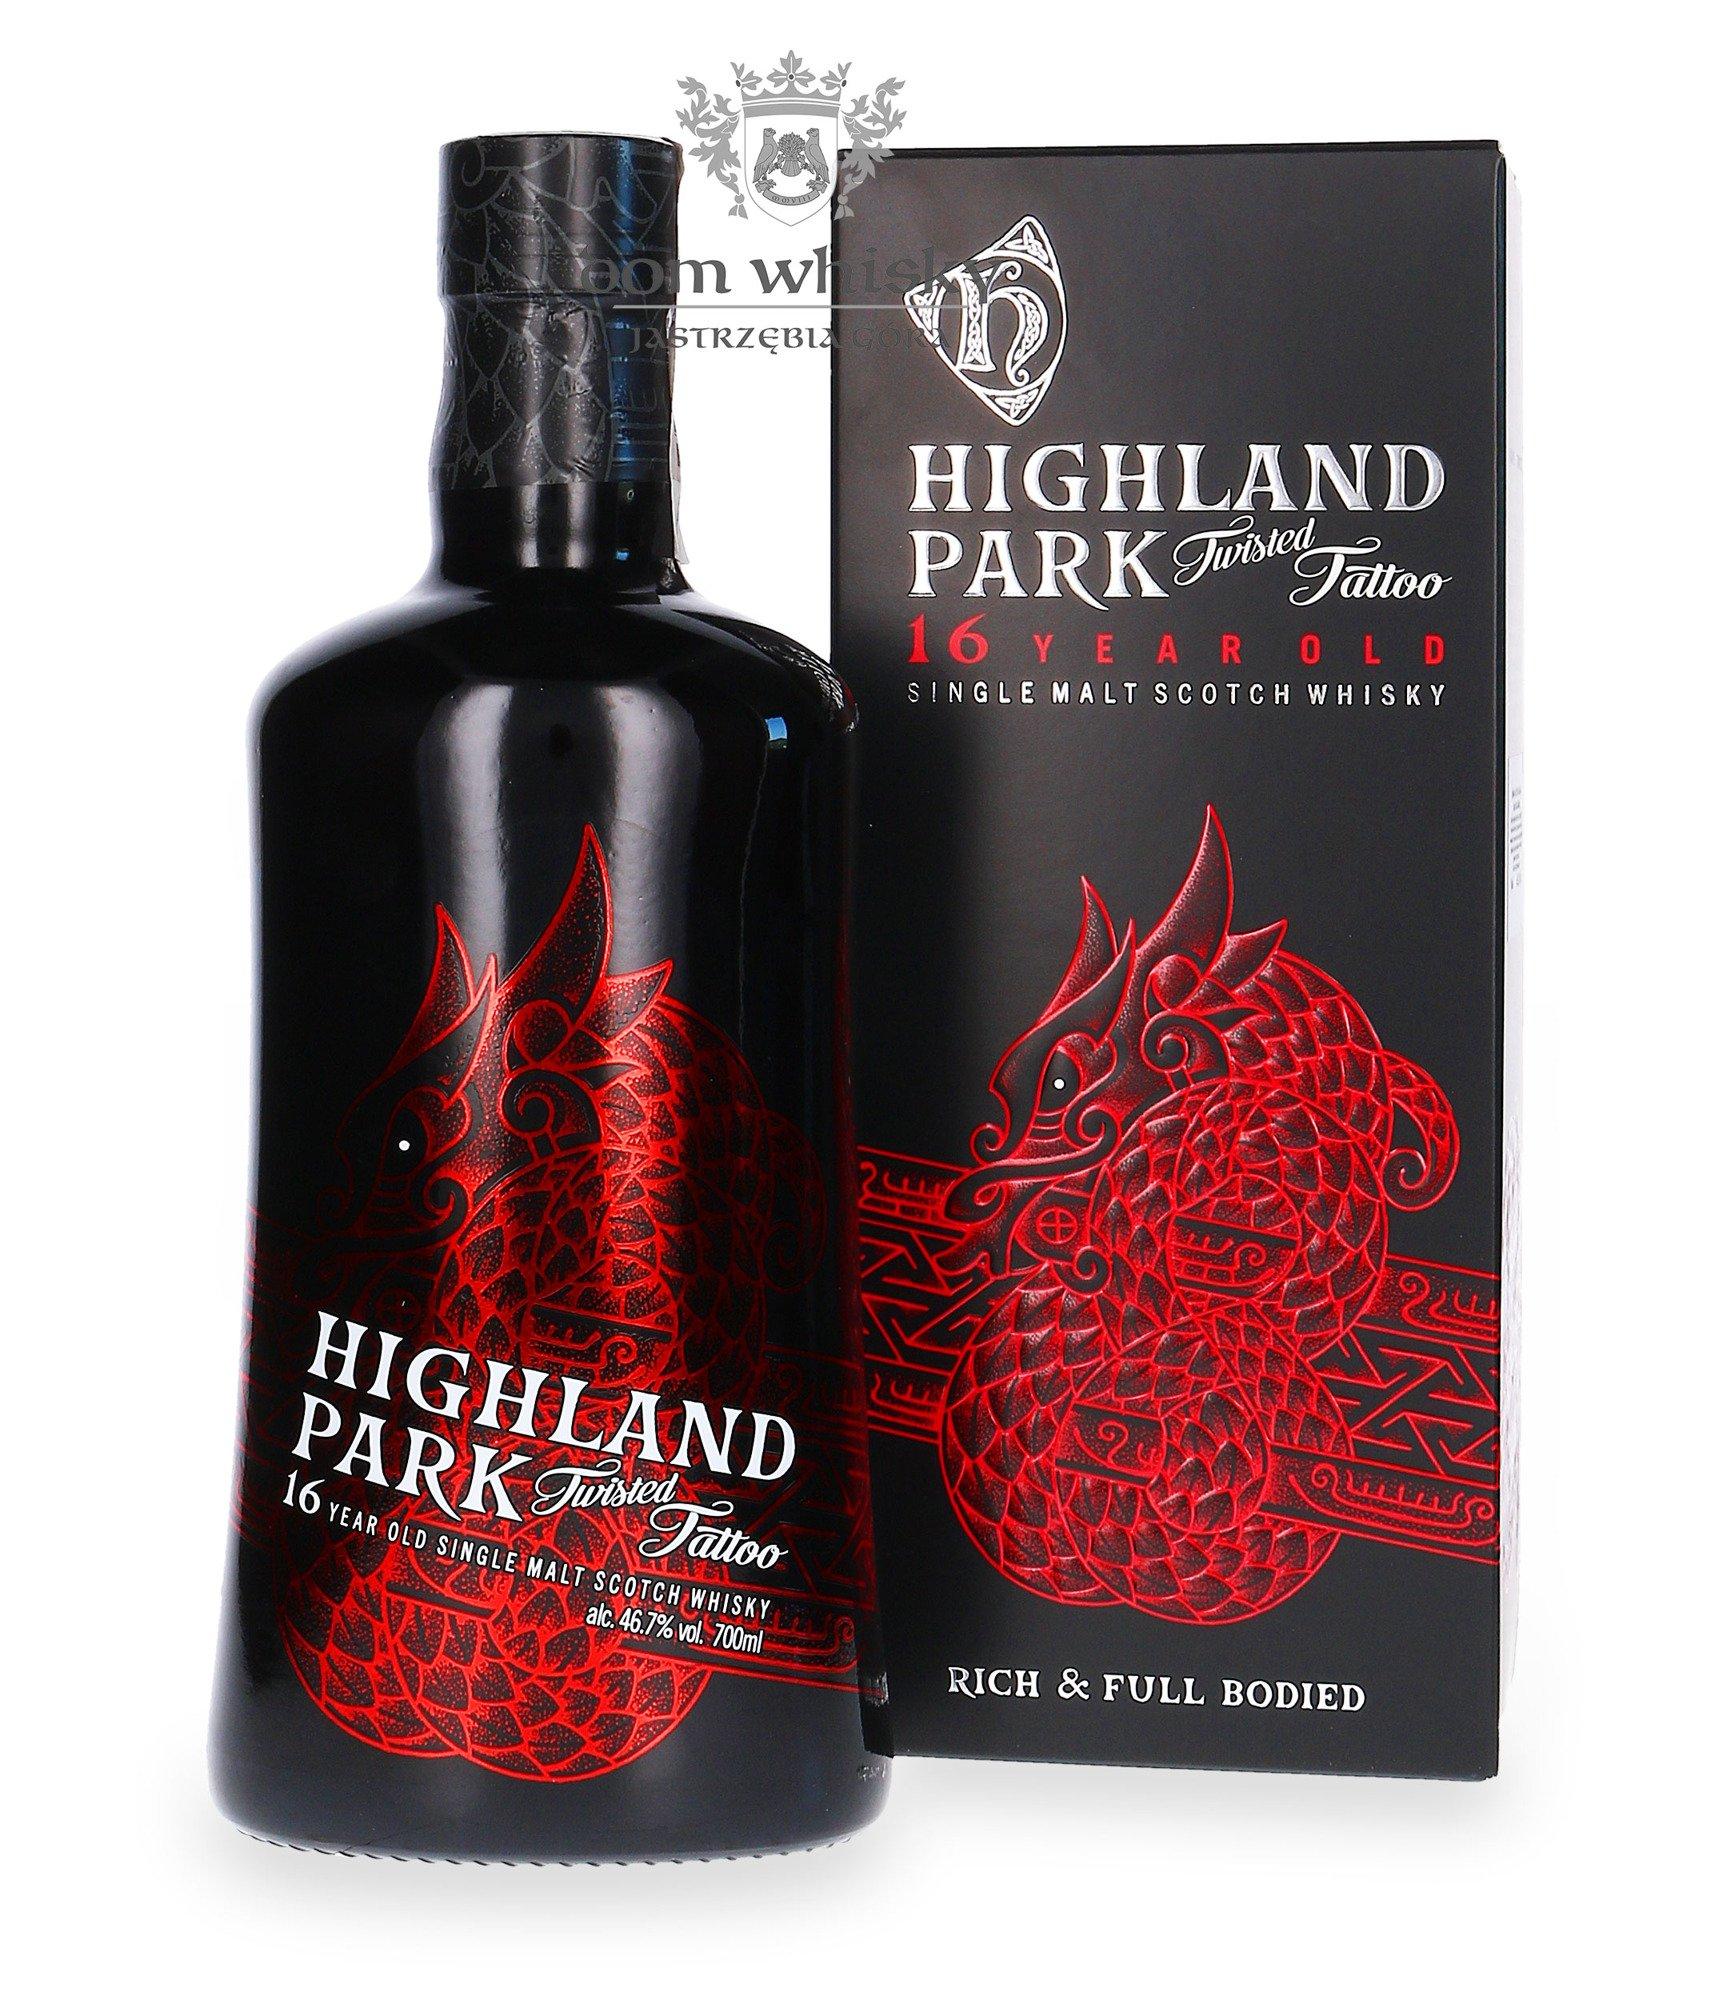 Highland Park 16 Letni Twisted Tattoo 467 07l